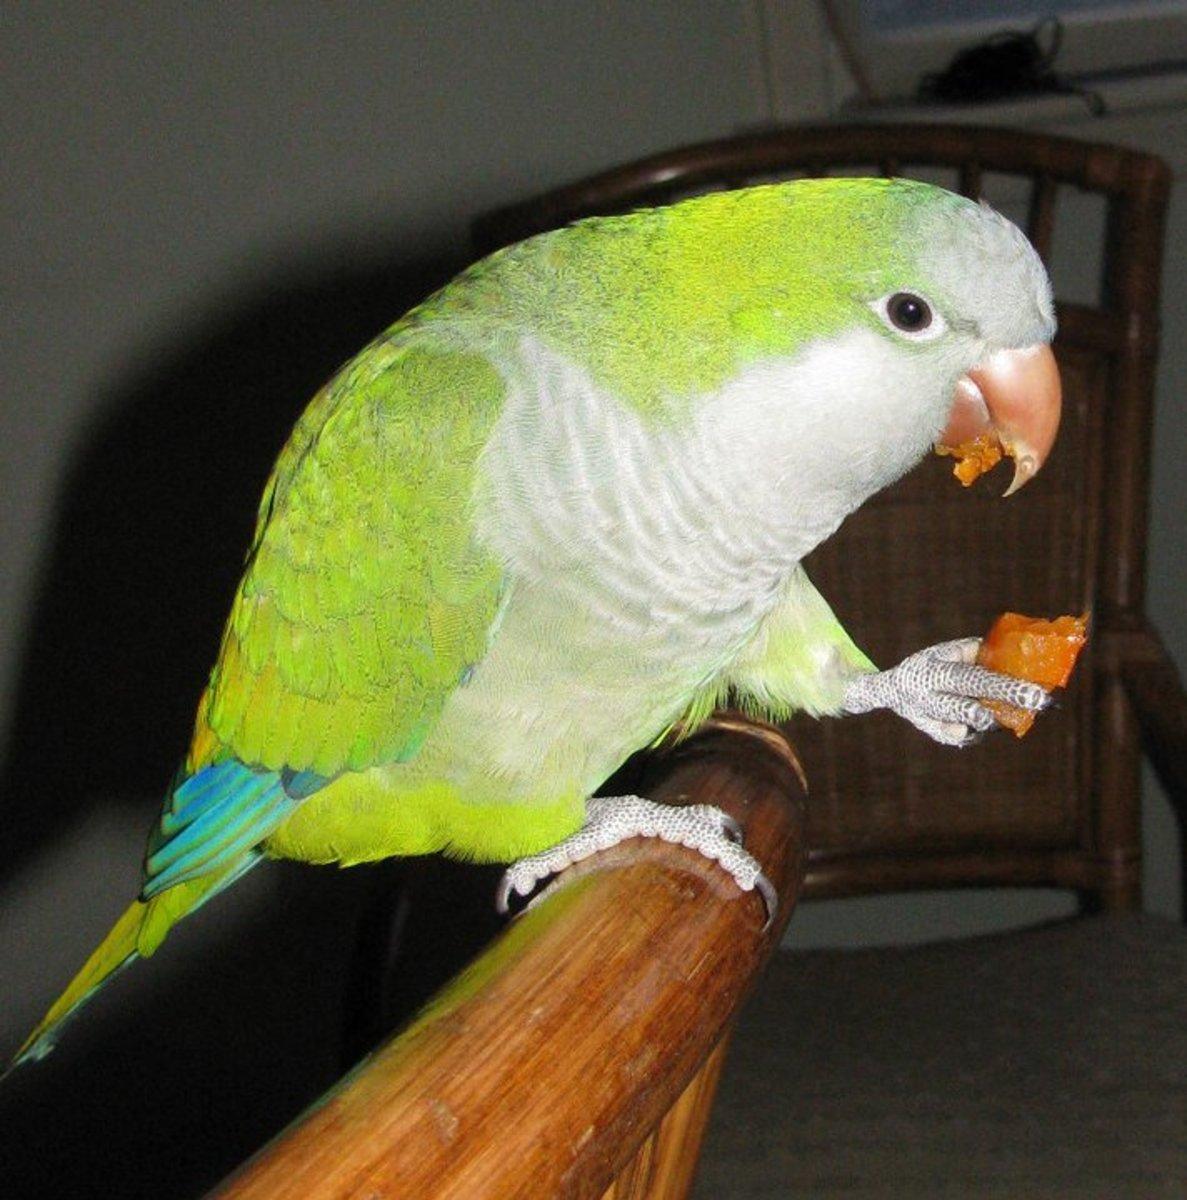 Ernie enjoying a carrot.